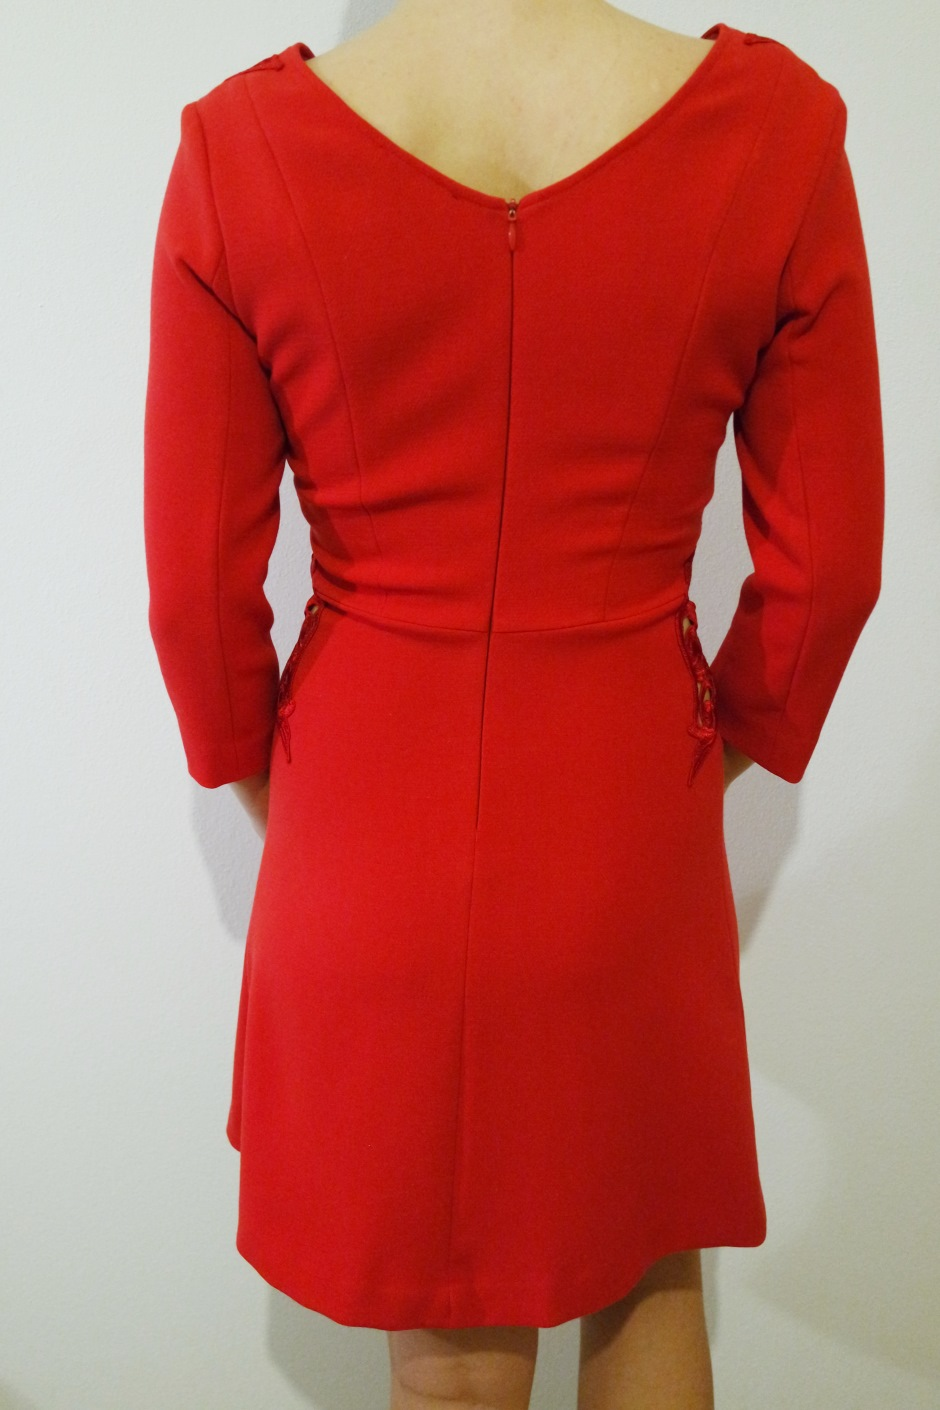 Outfit per San Valentino 2016 - Rosso 2